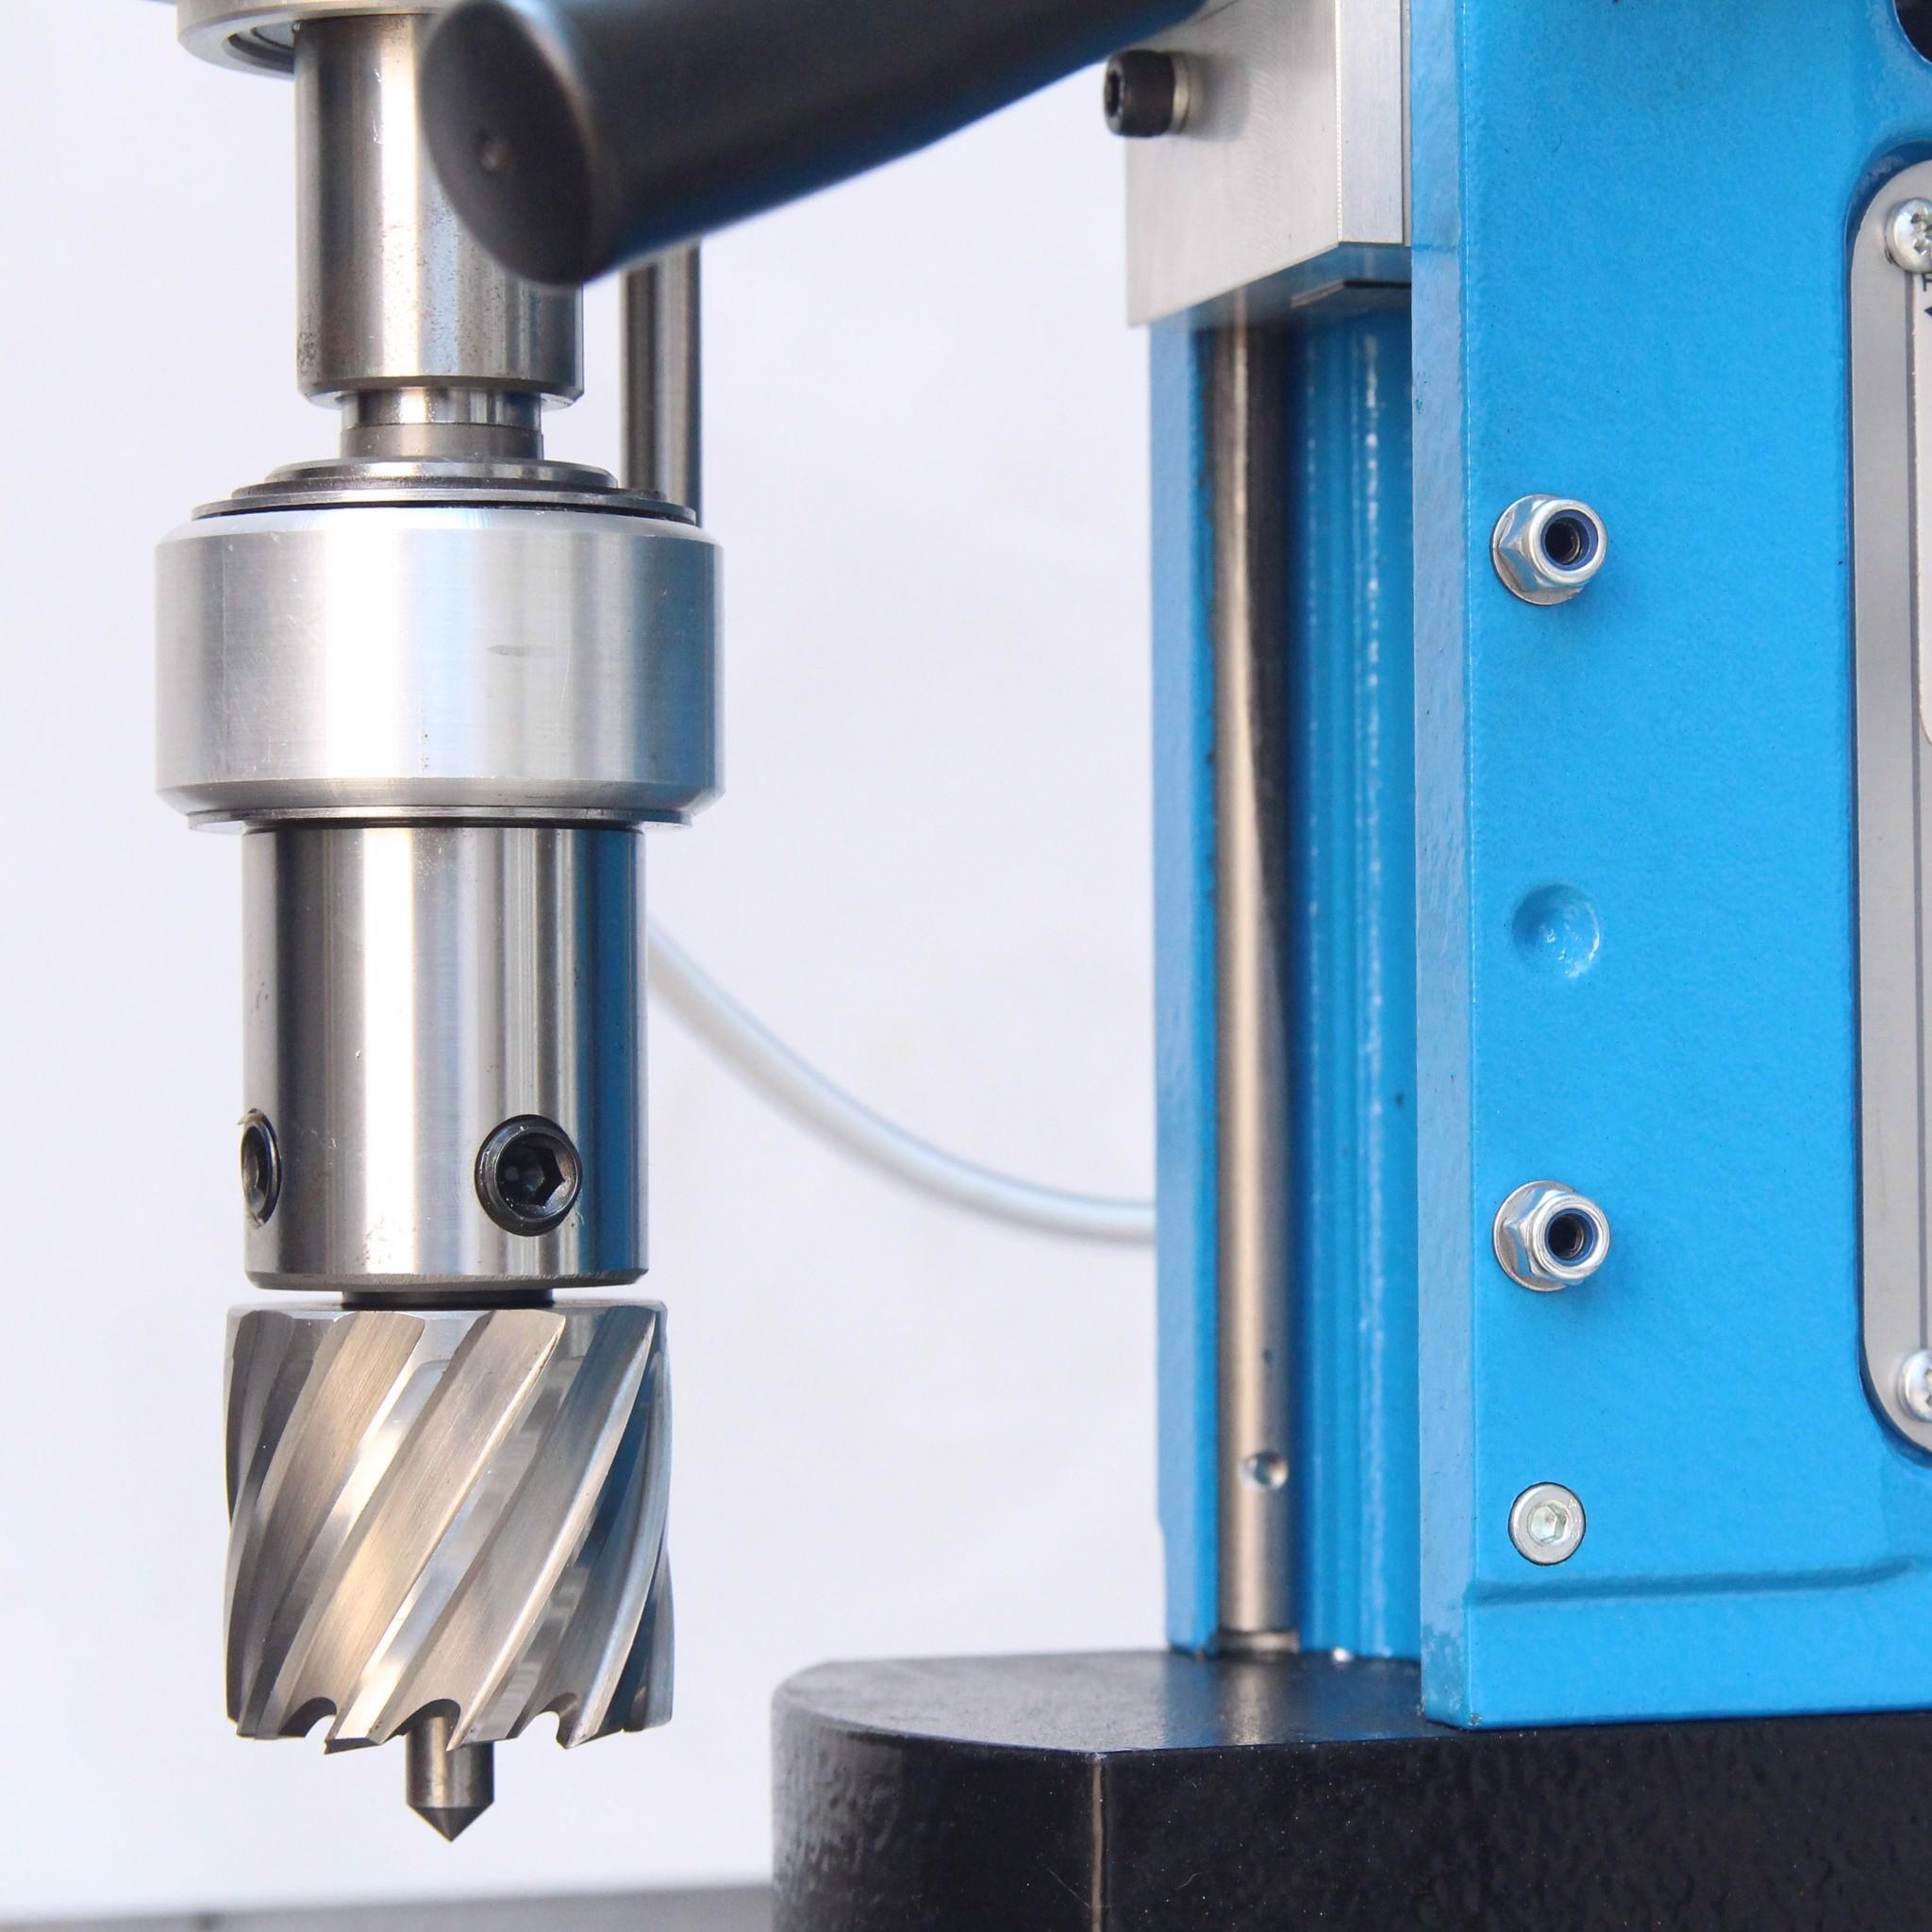 Máy khoan taro đế từ MDT55 gắn mũi khoan từ